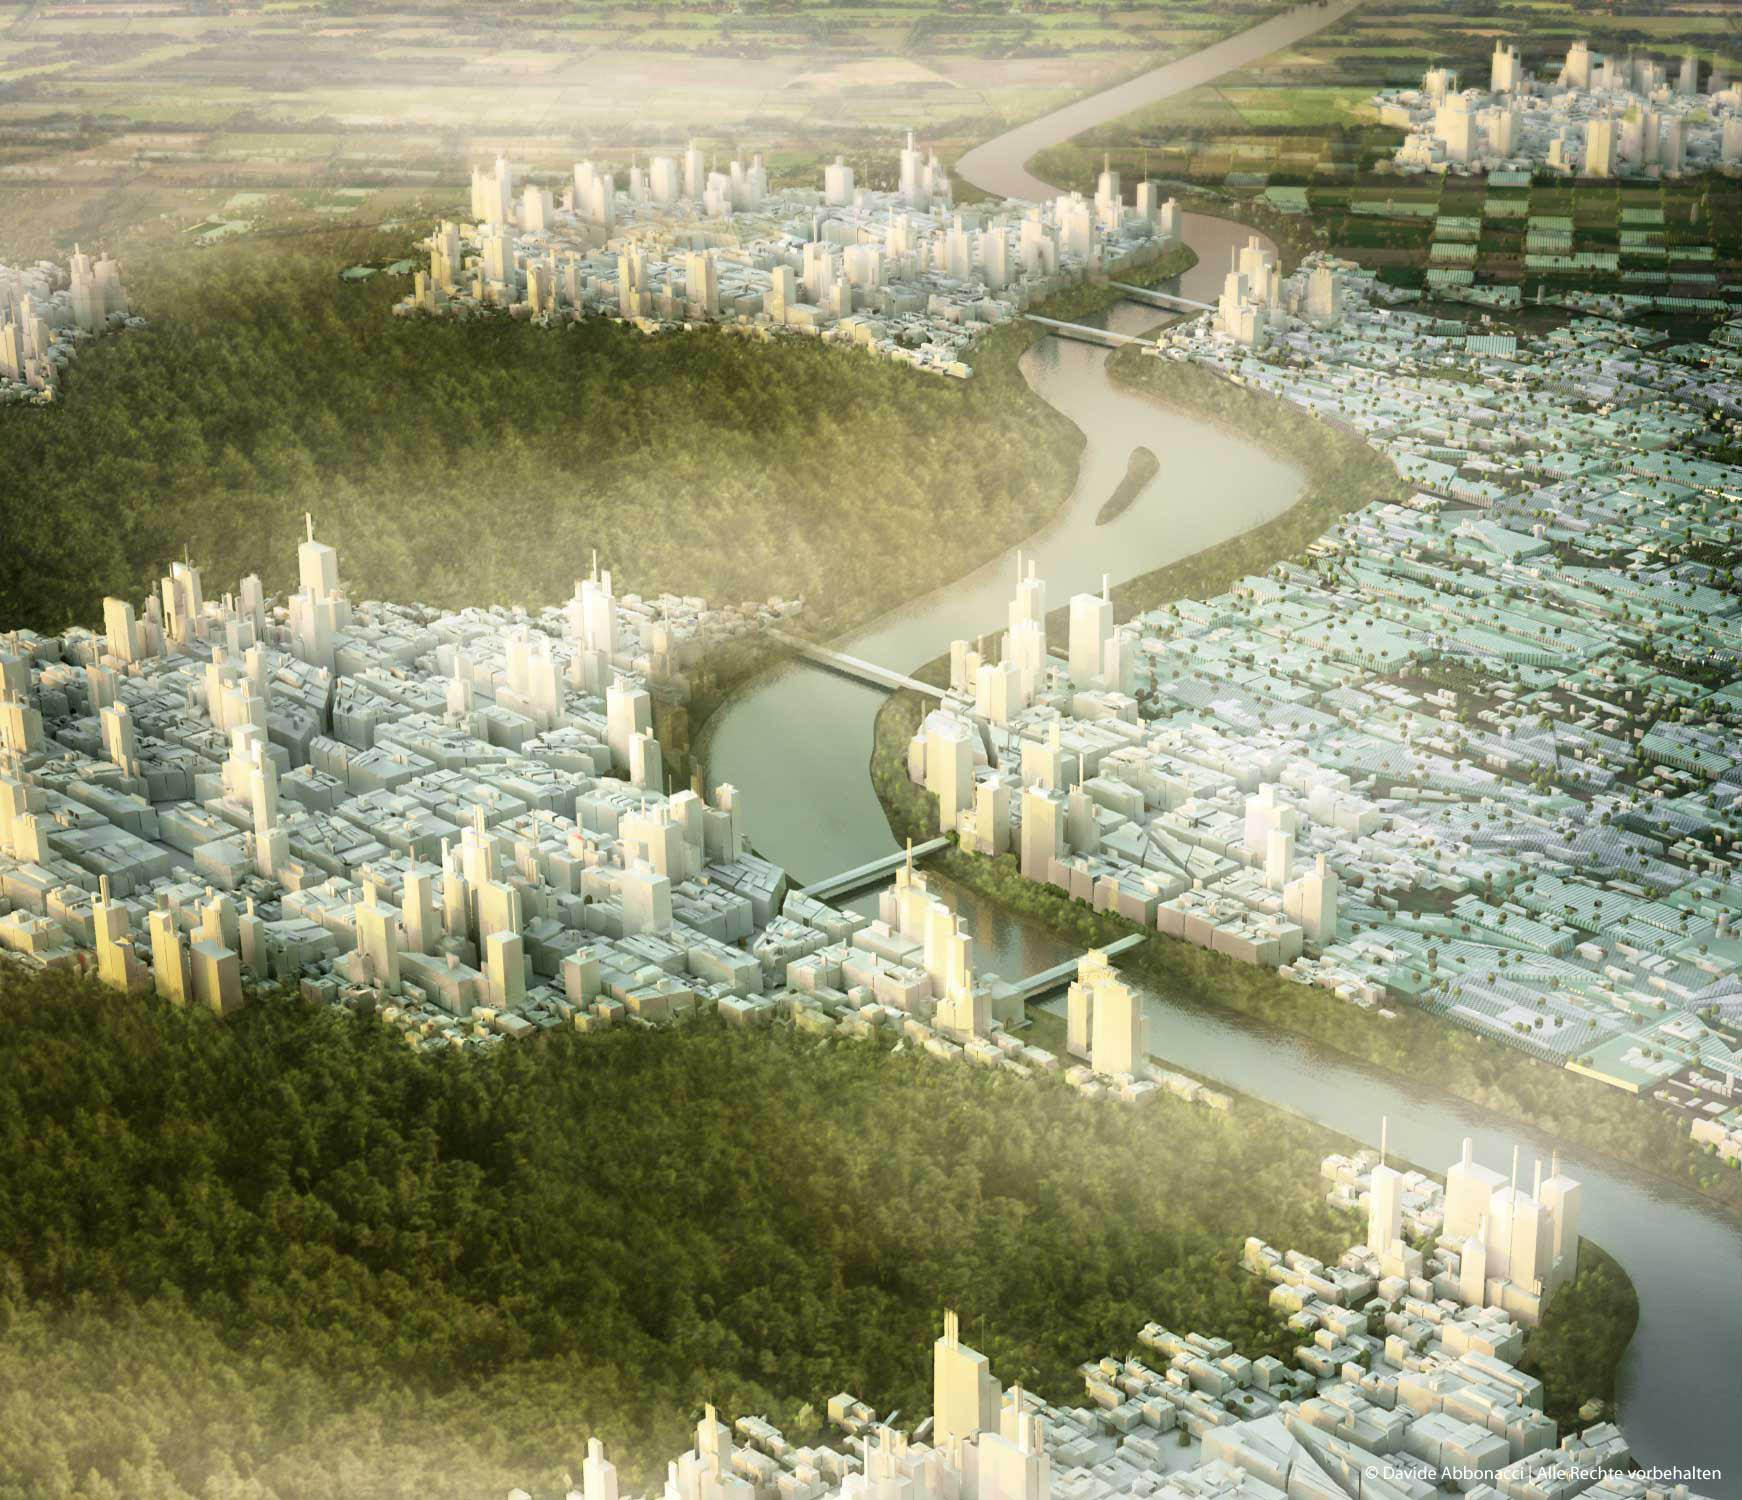 Grand Paris - Métropole Douce - Propositions for the Post-Kyoto Metropolis | LIN Architects Urbanists | 2009 Masterplan - Studie